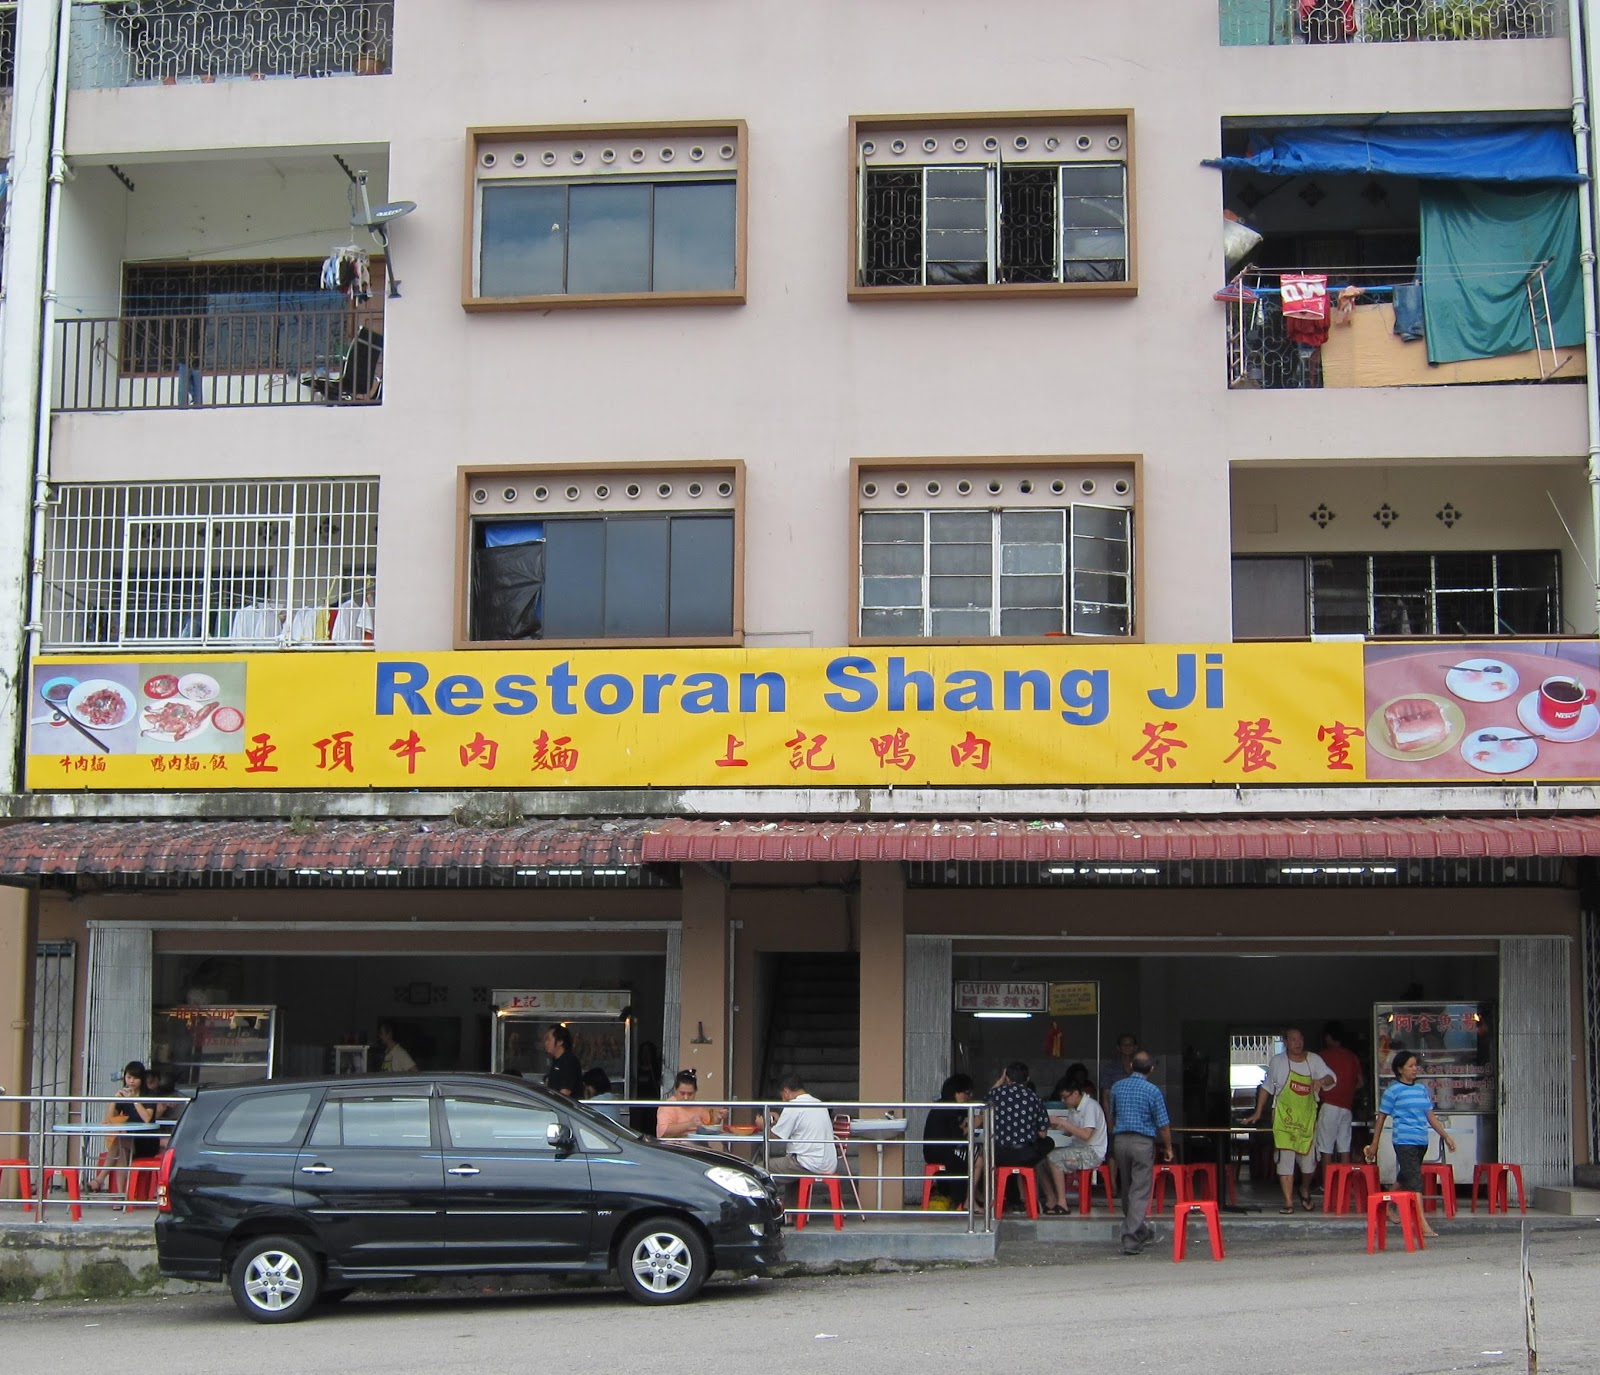 Tin & Tin (Cathay) Beef Kway Teow (inside Shang Ji Coffee